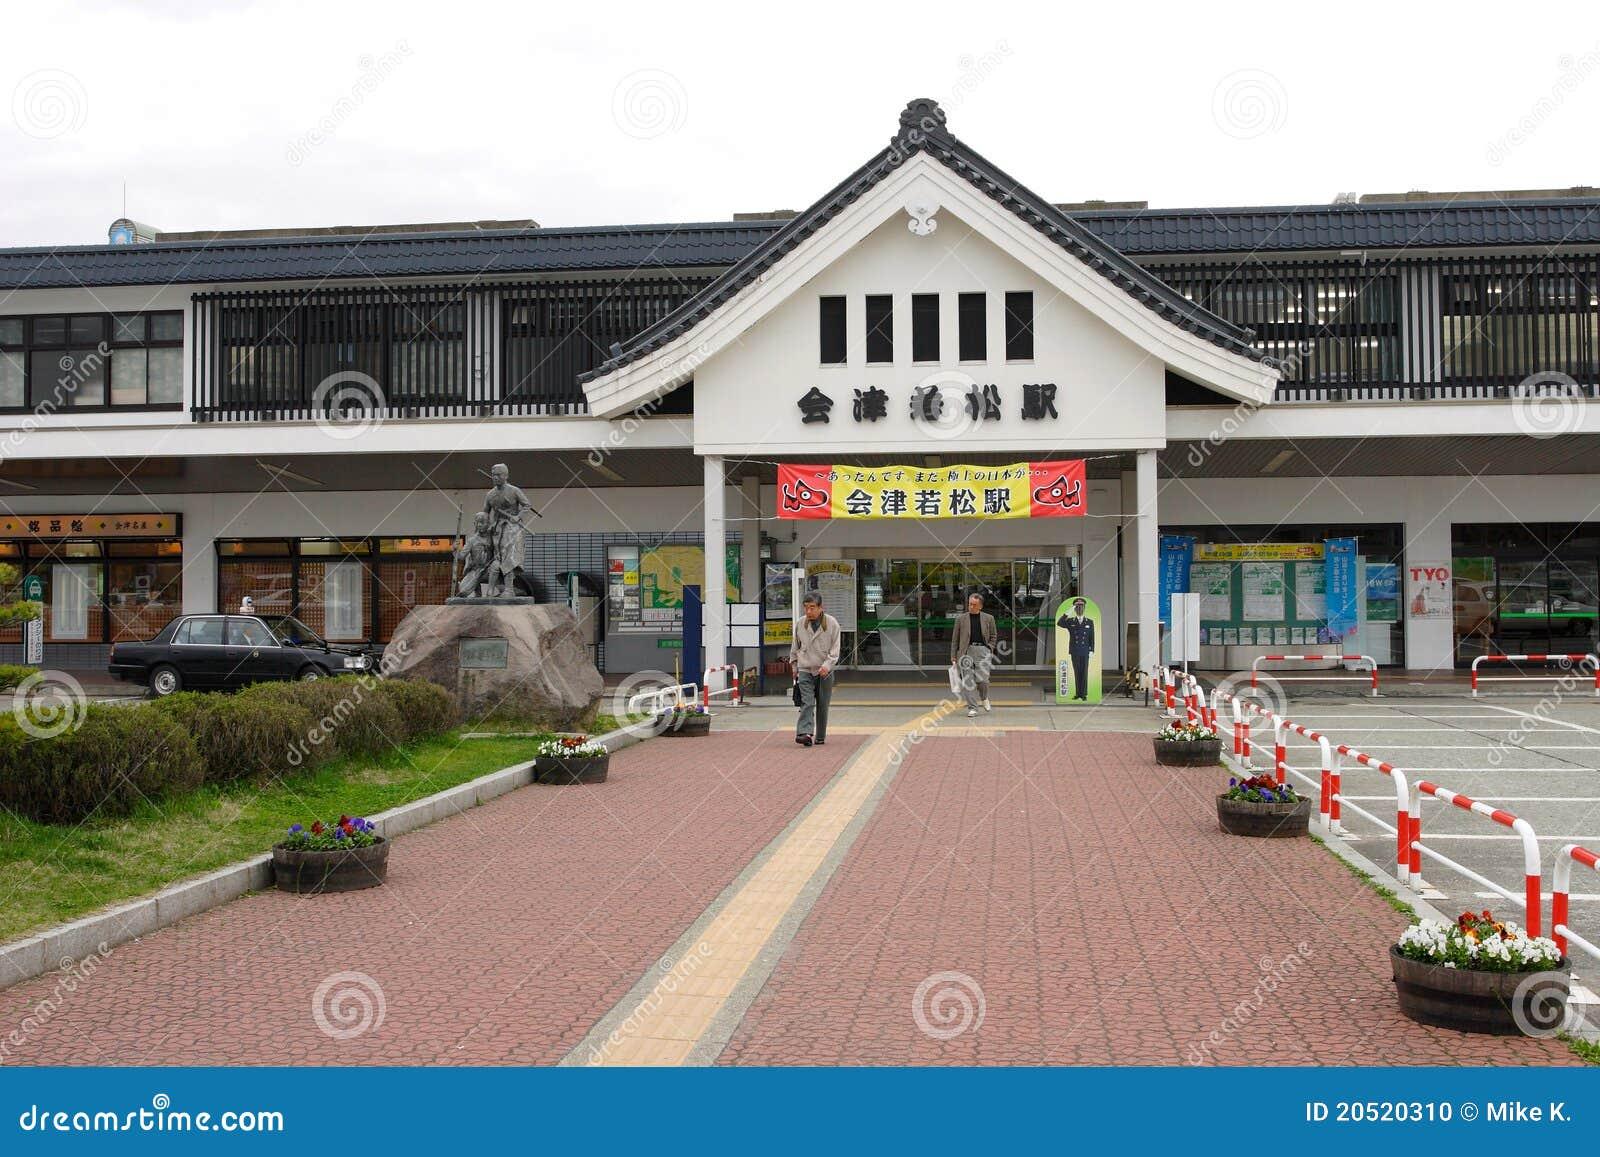 Aizuwakamatsu Station